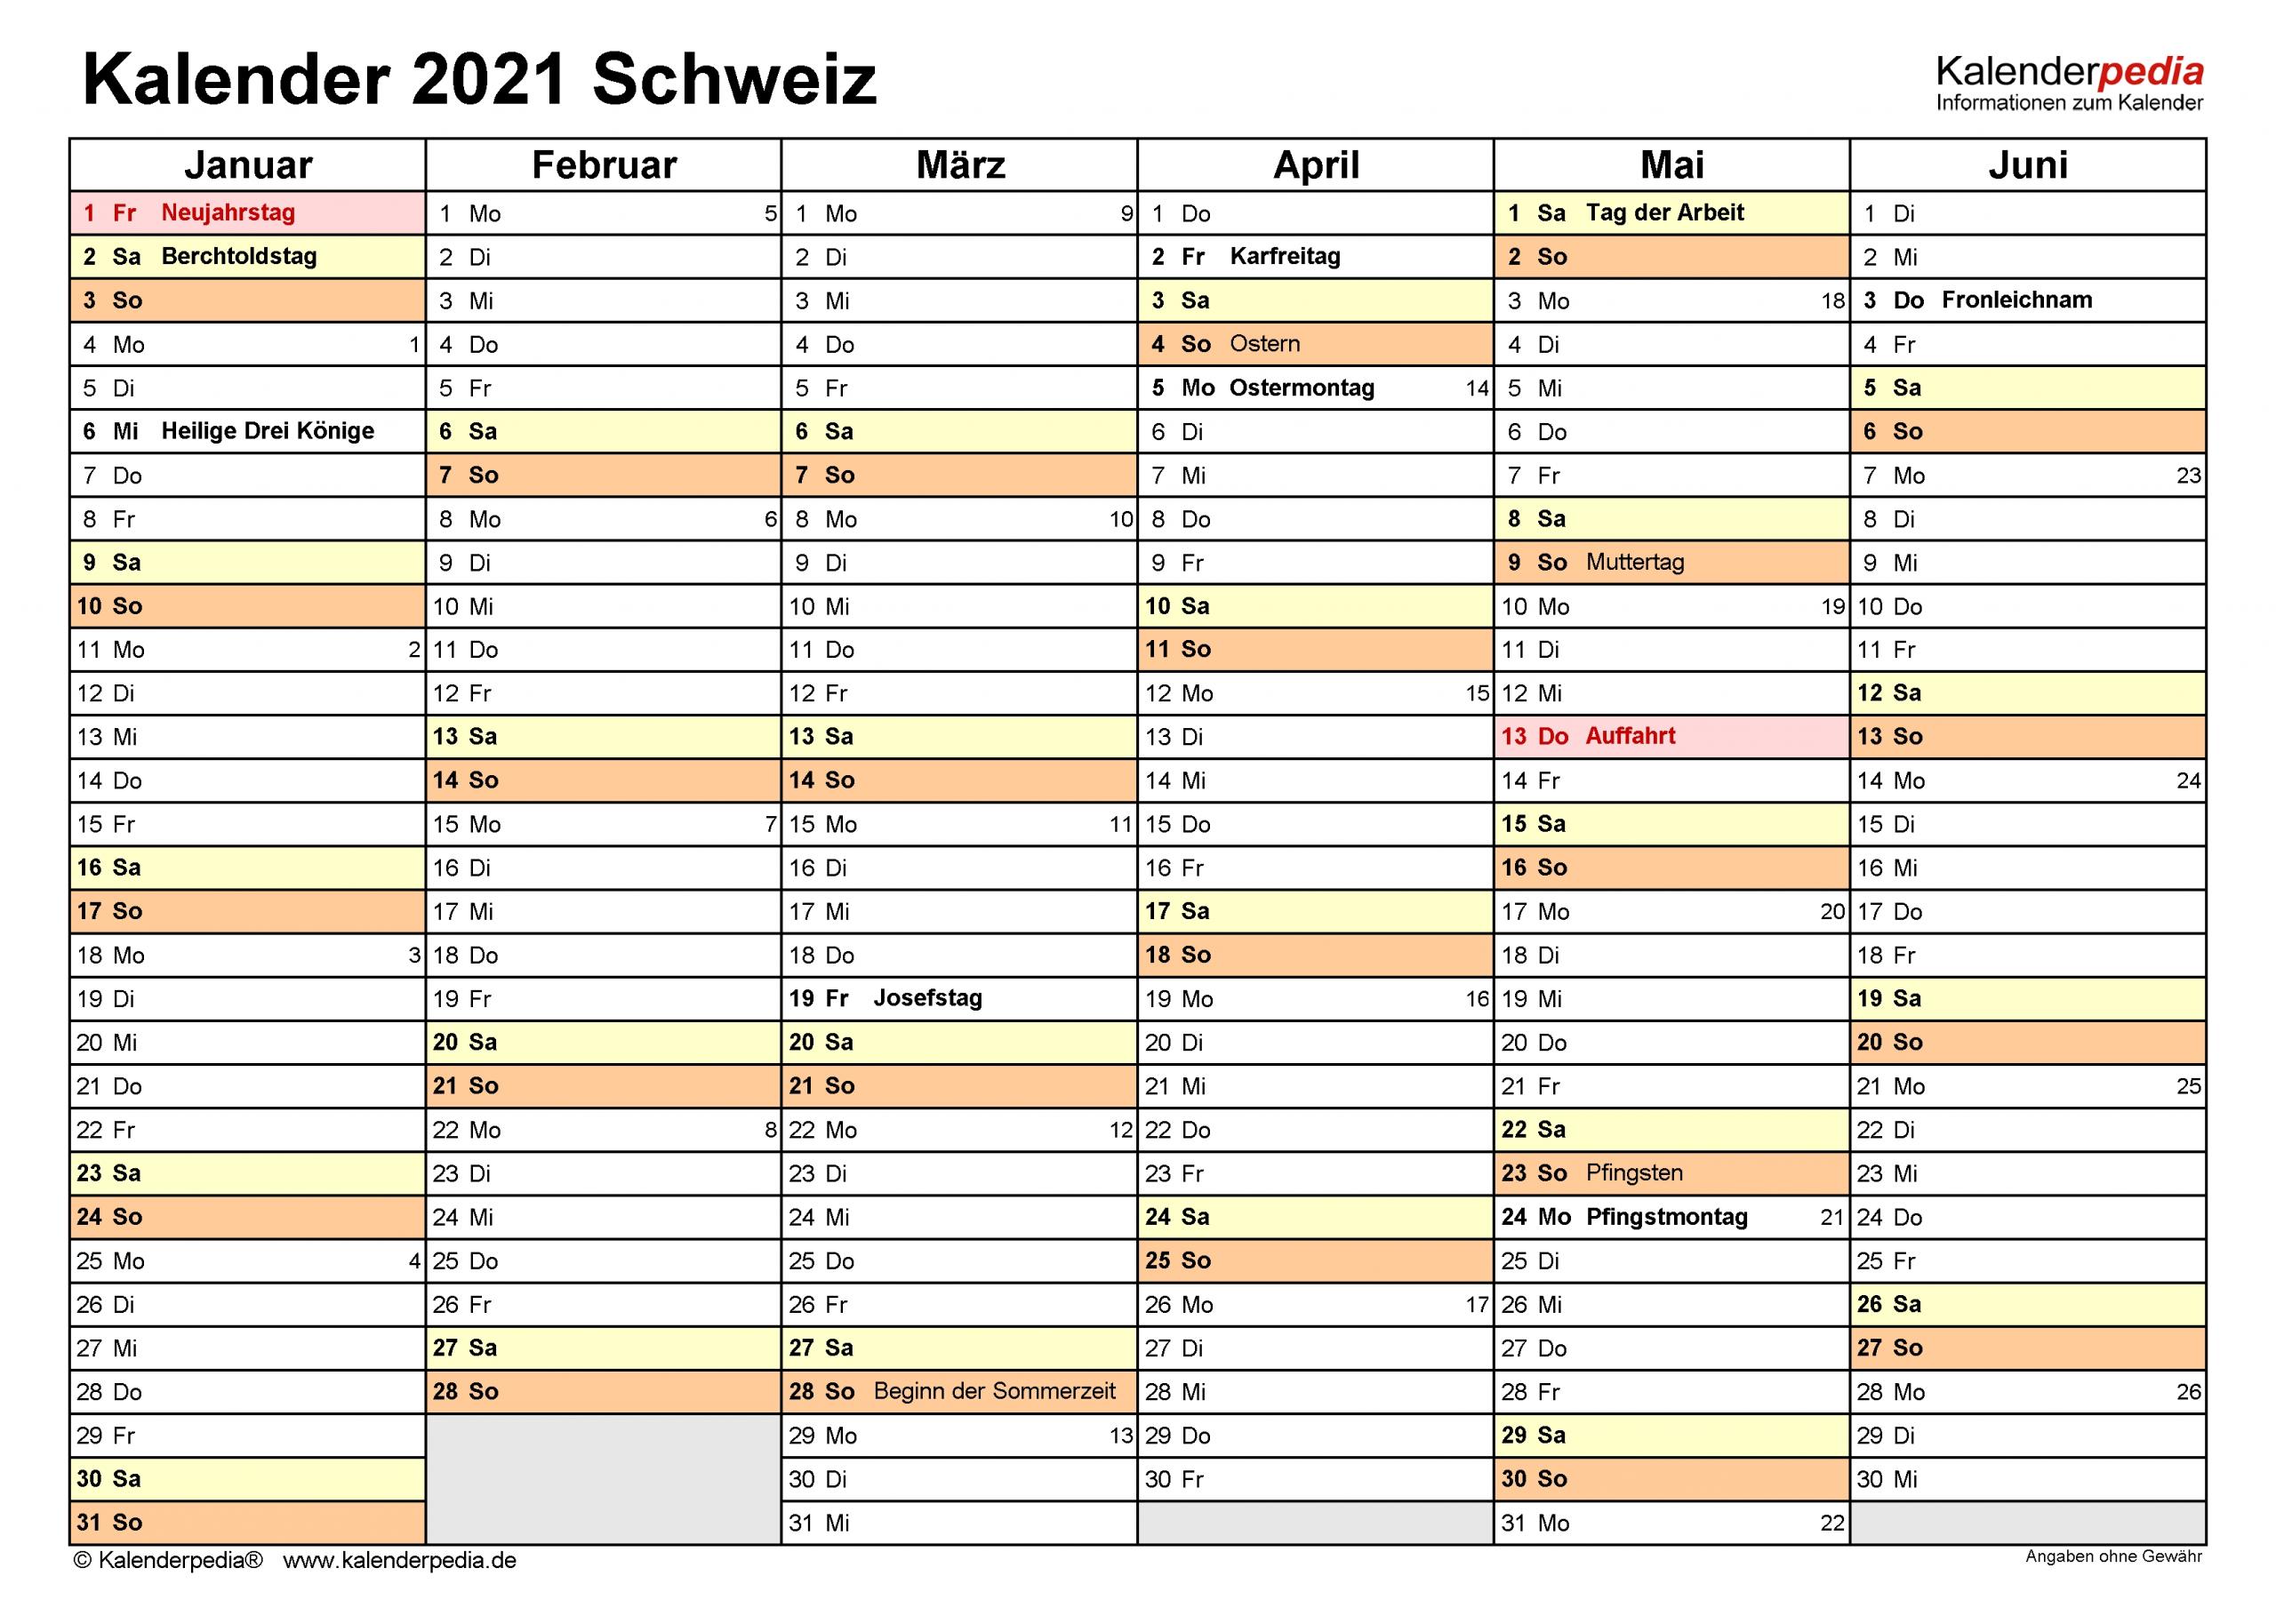 Collect Kalenderpedia 2021 Schweiz Pro Monat